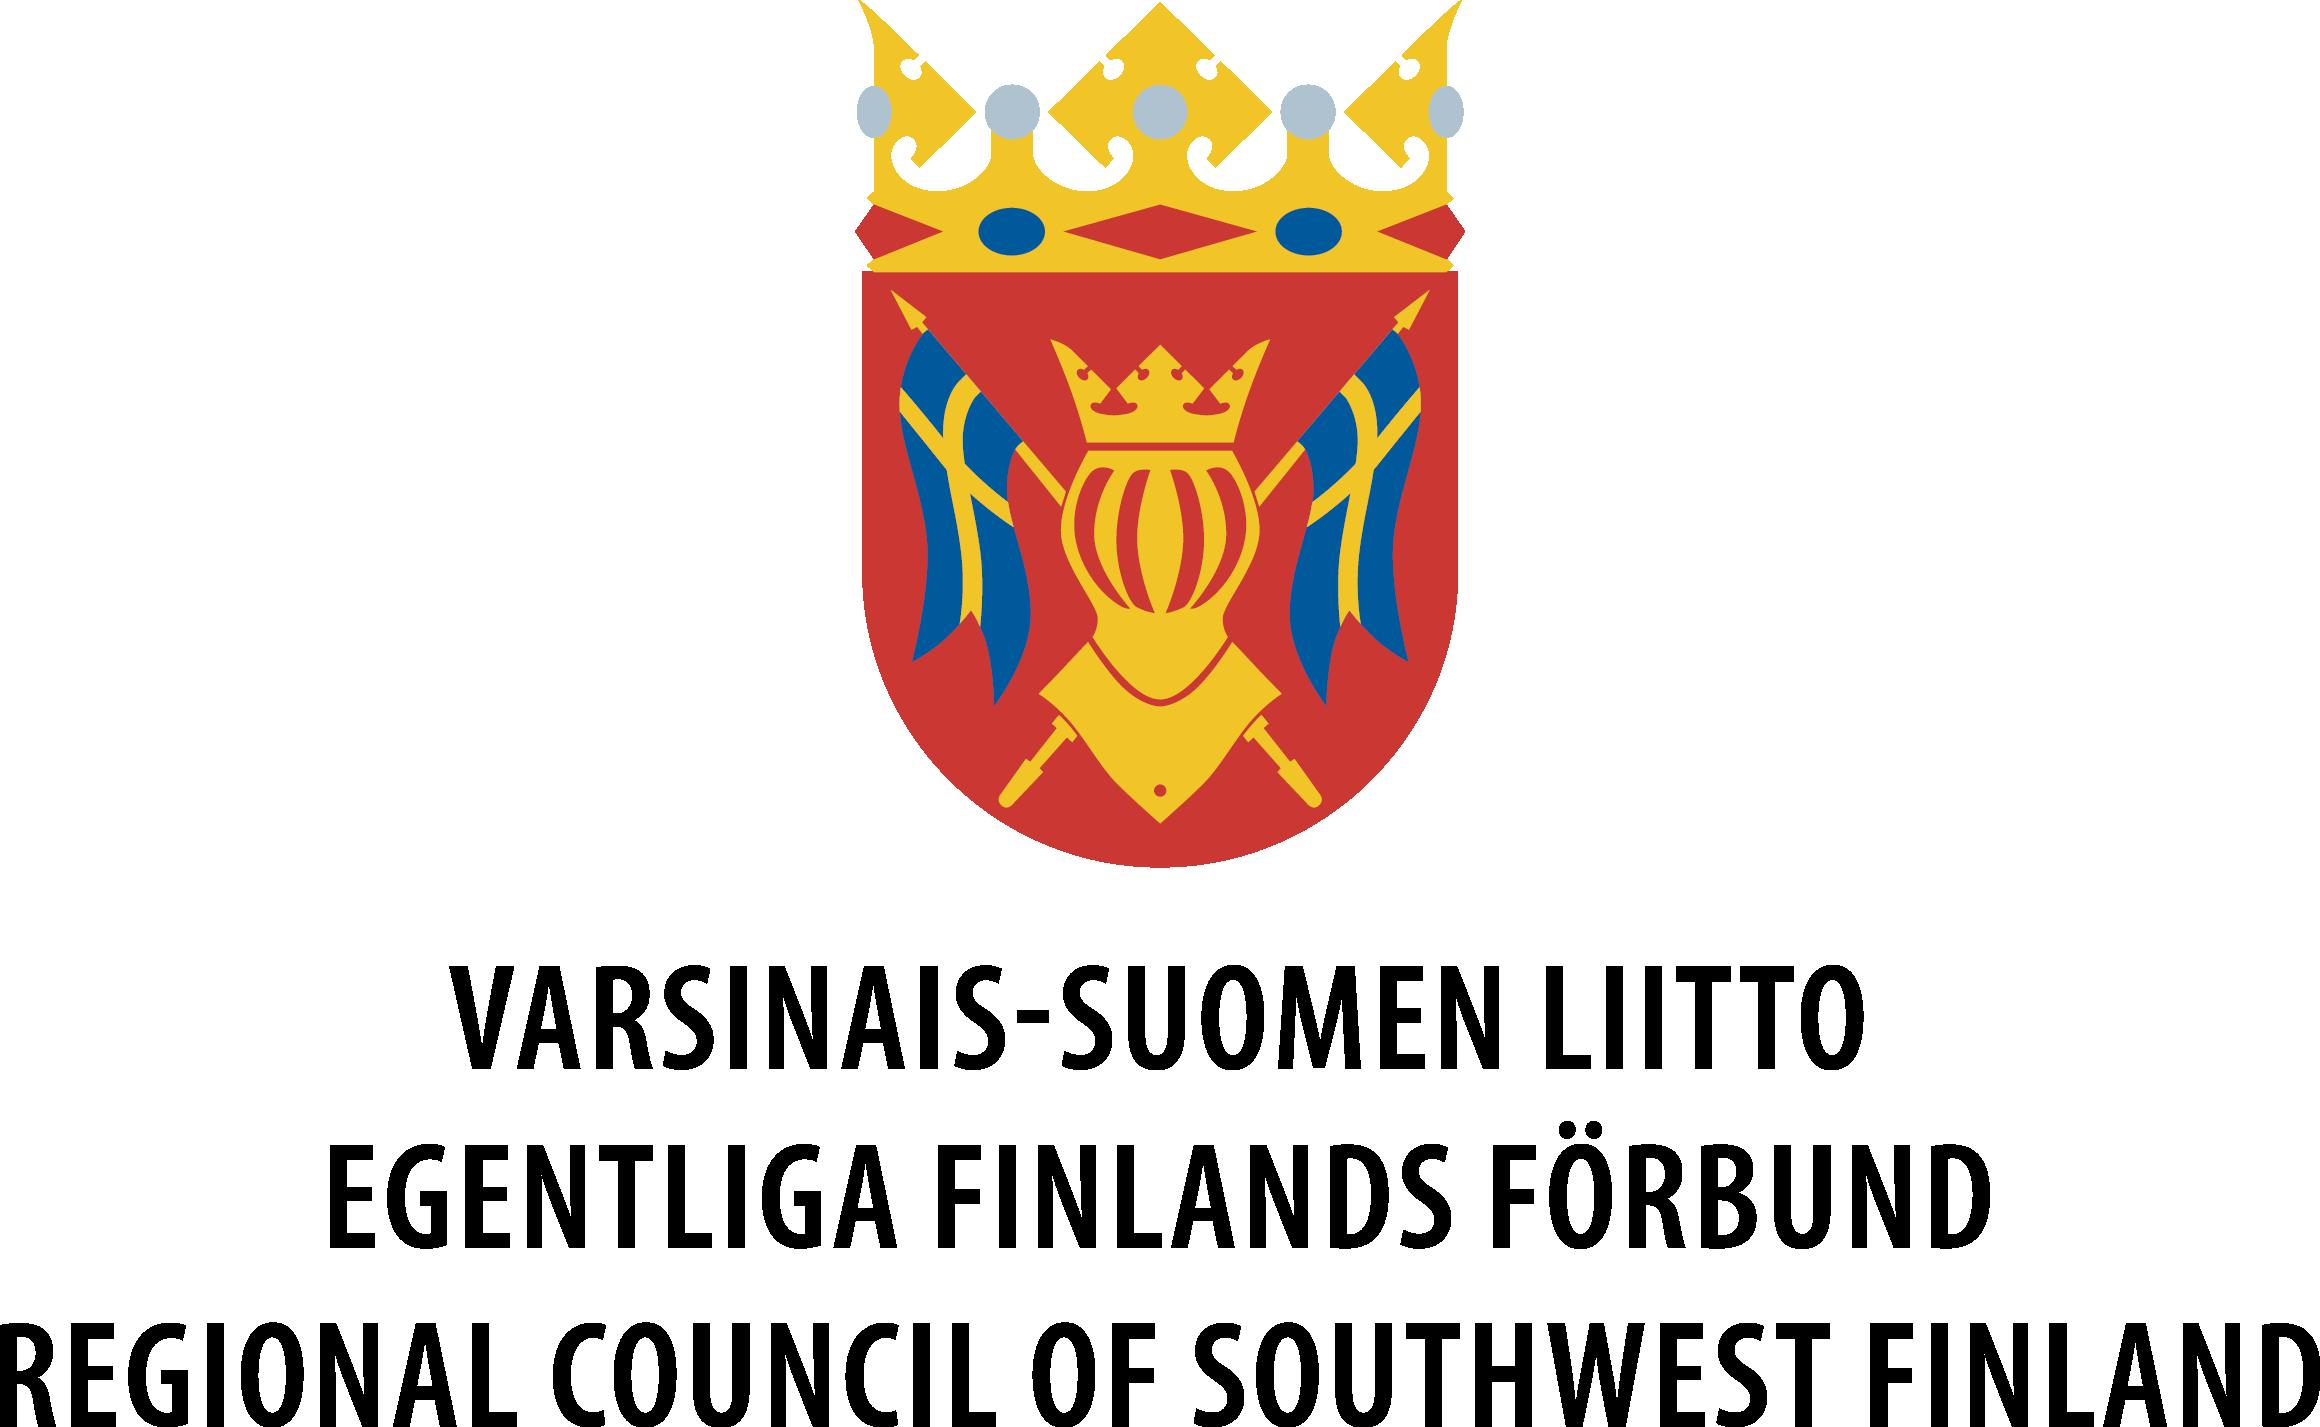 Varsinais-Suomen Liitto